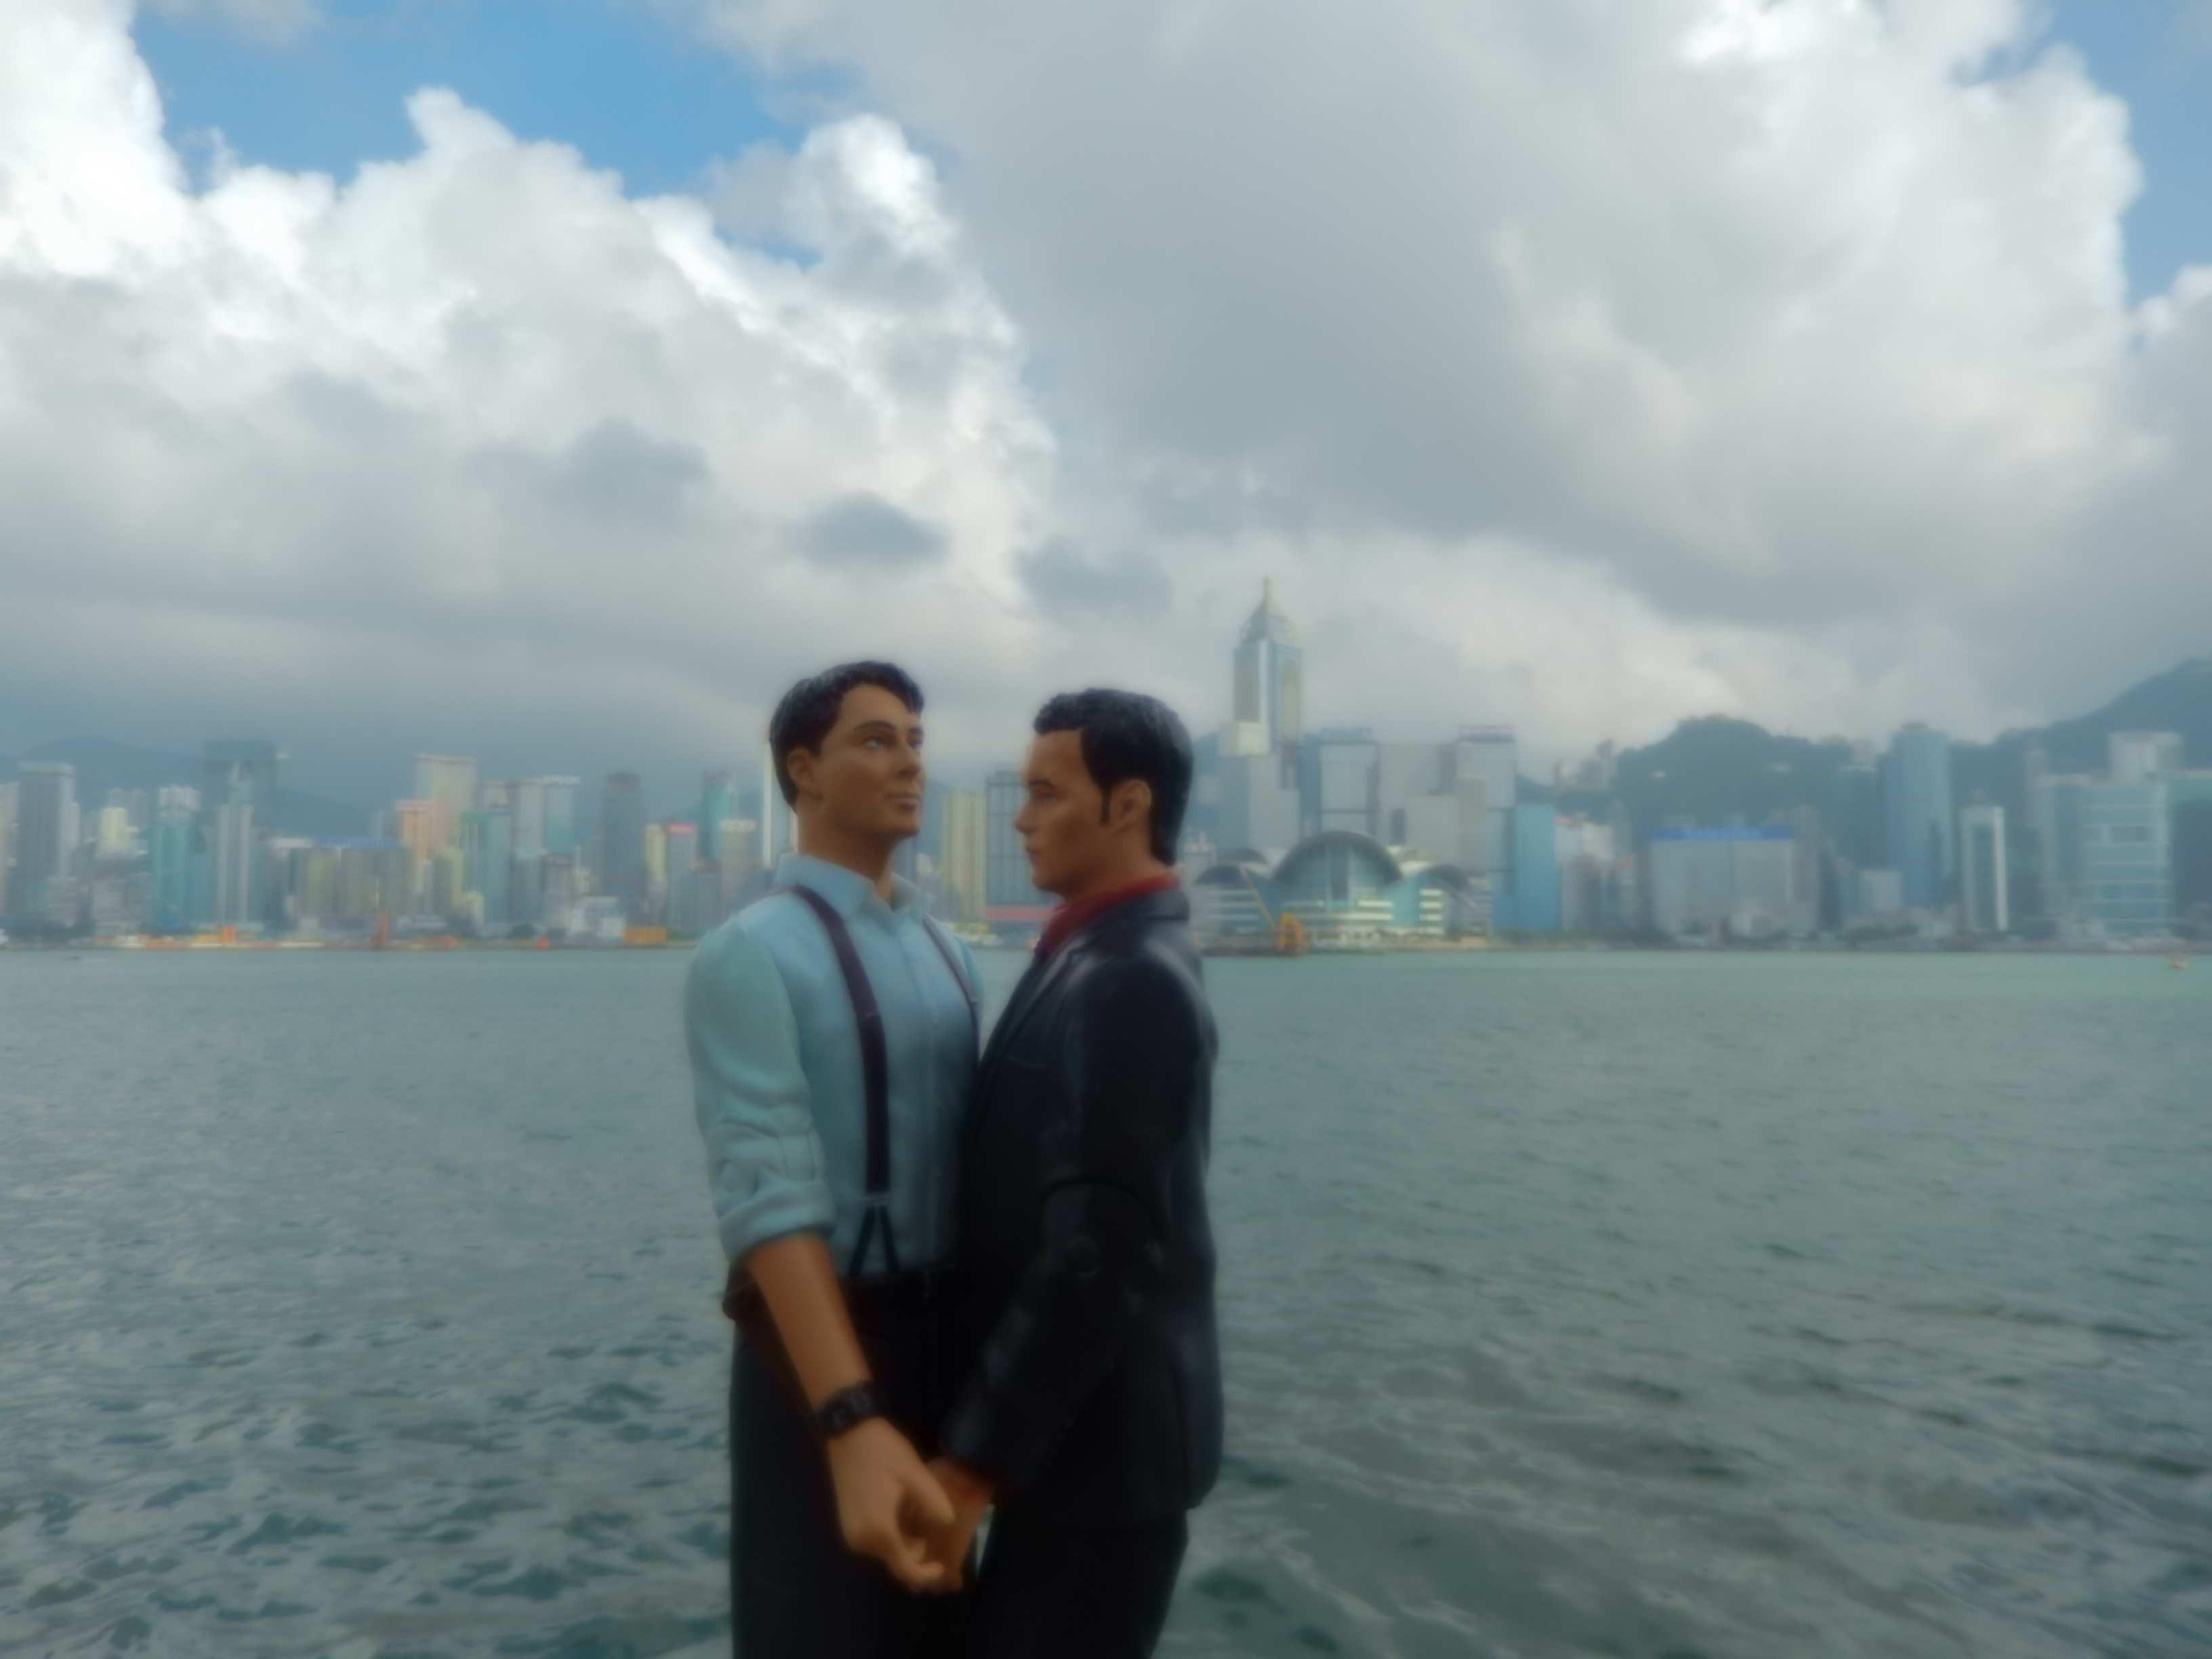 2013.06.26 - 02 - Hong Kong